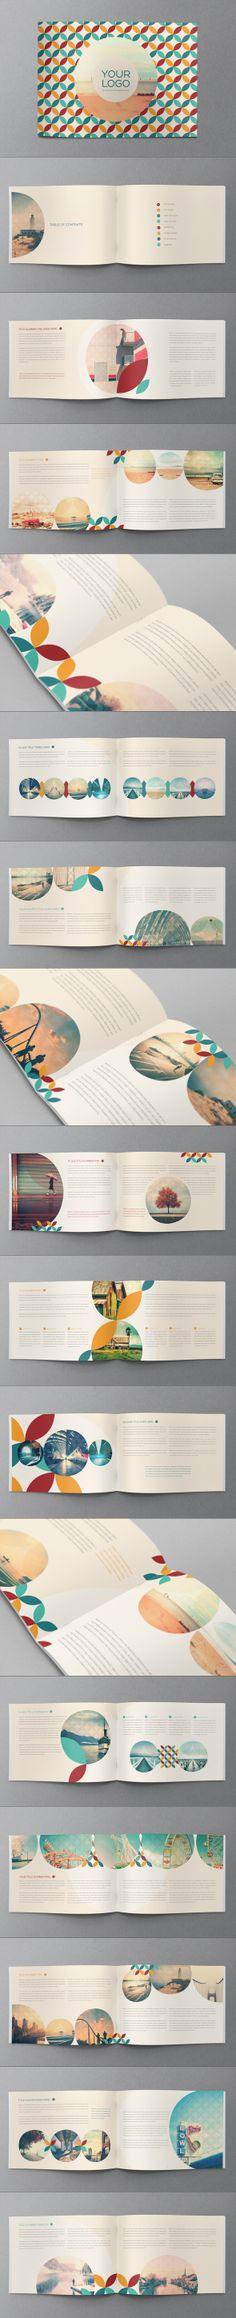 Retro Vintage Brochure on Behance Print \ layout Pinterest - retro brochure template